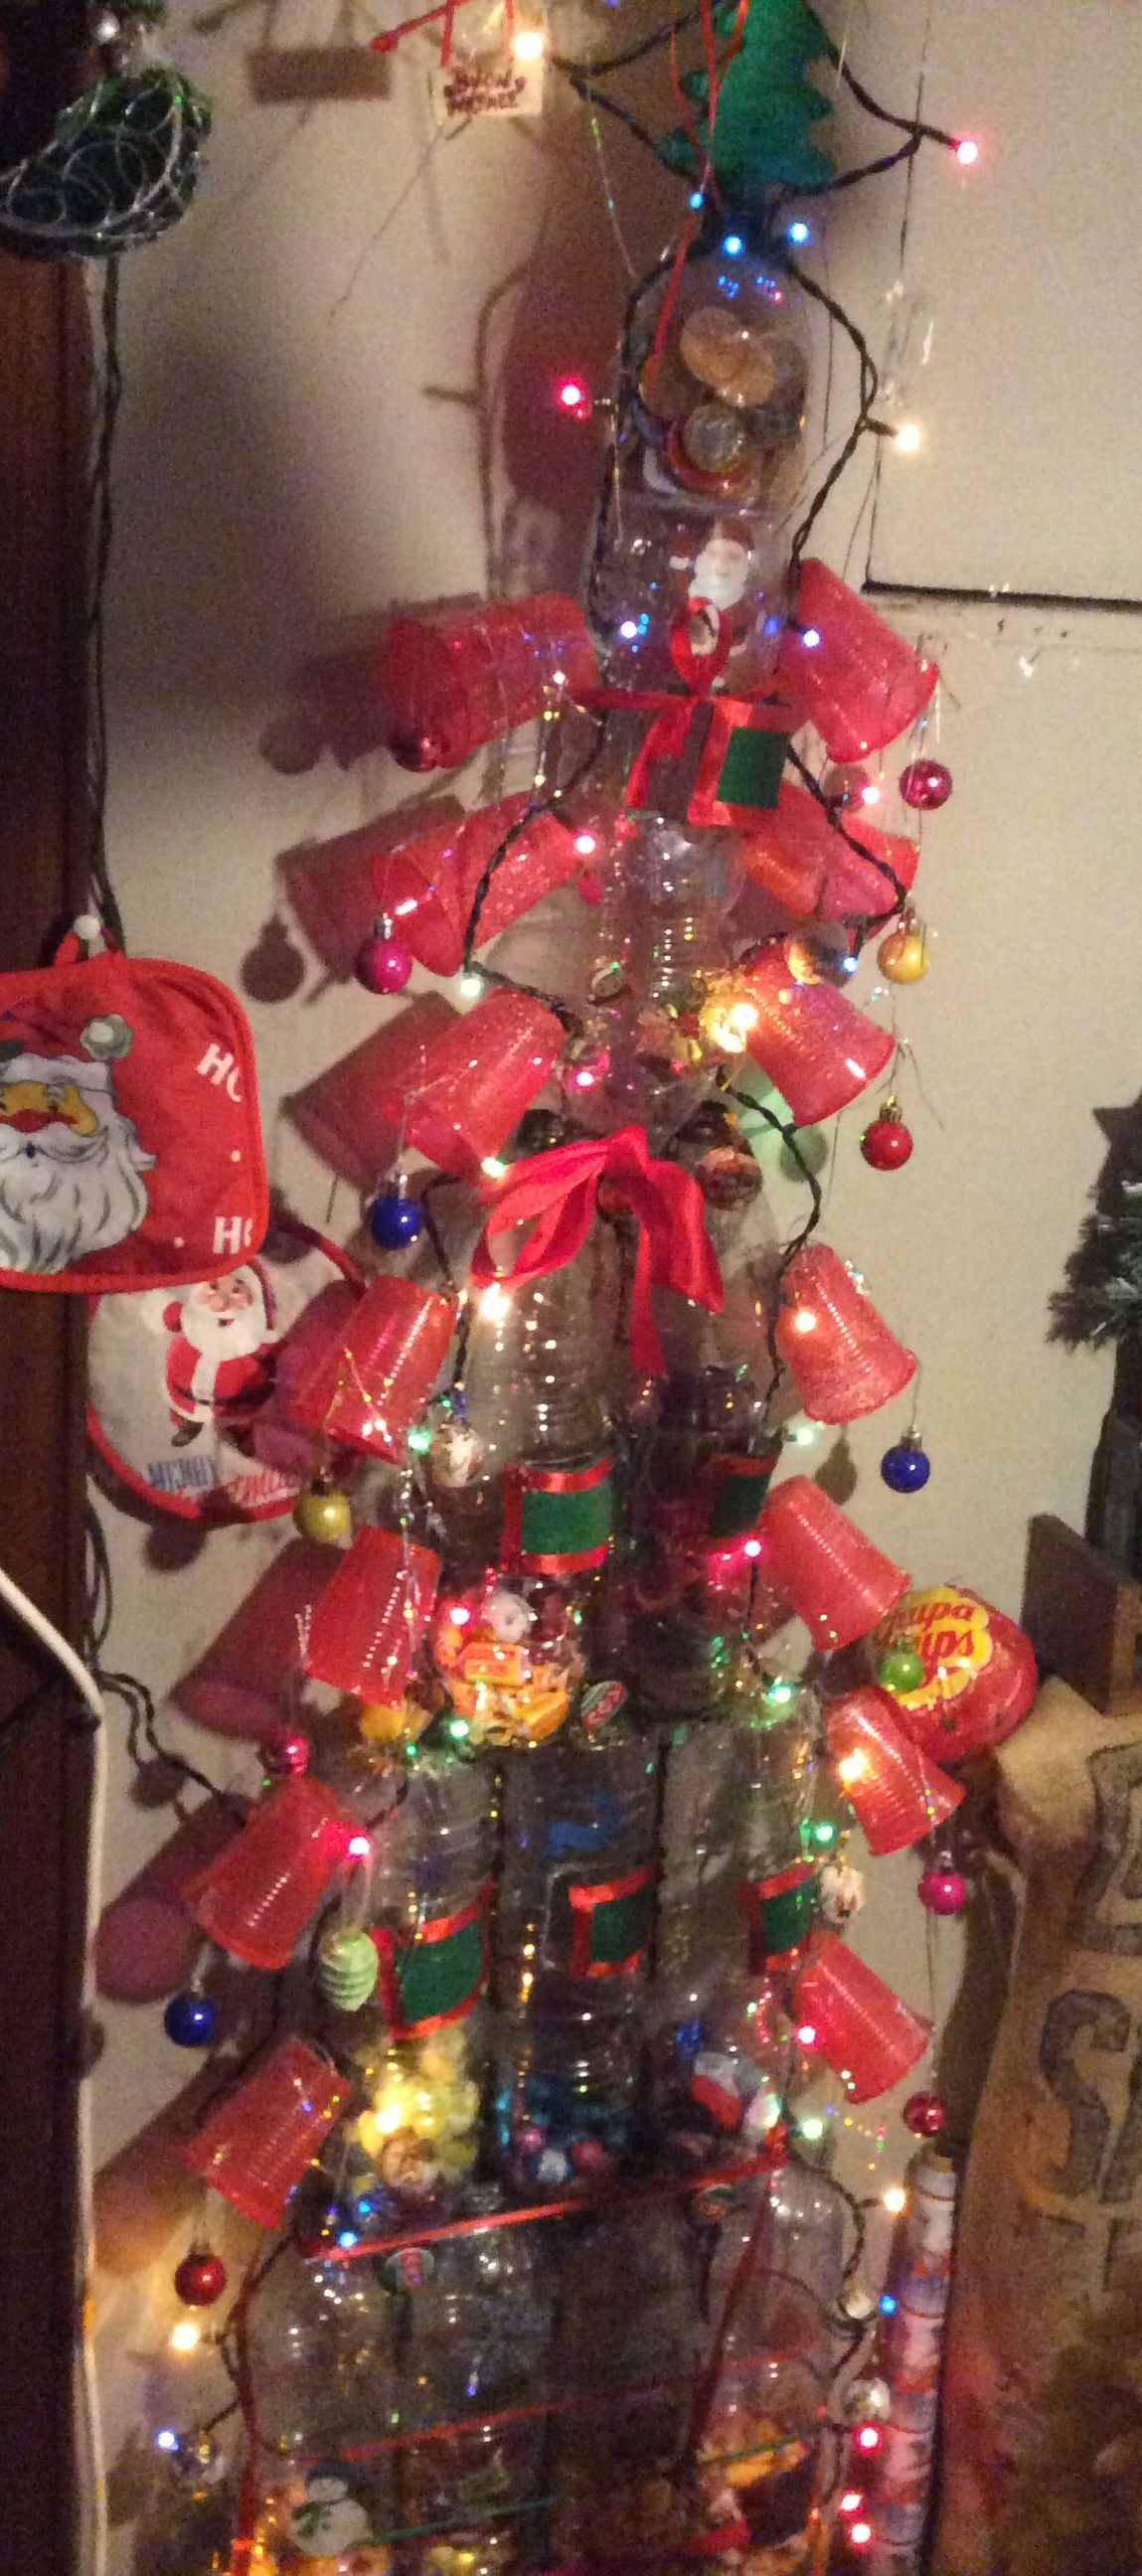 Christmas tree plastic bottles brings Christmas sweets …